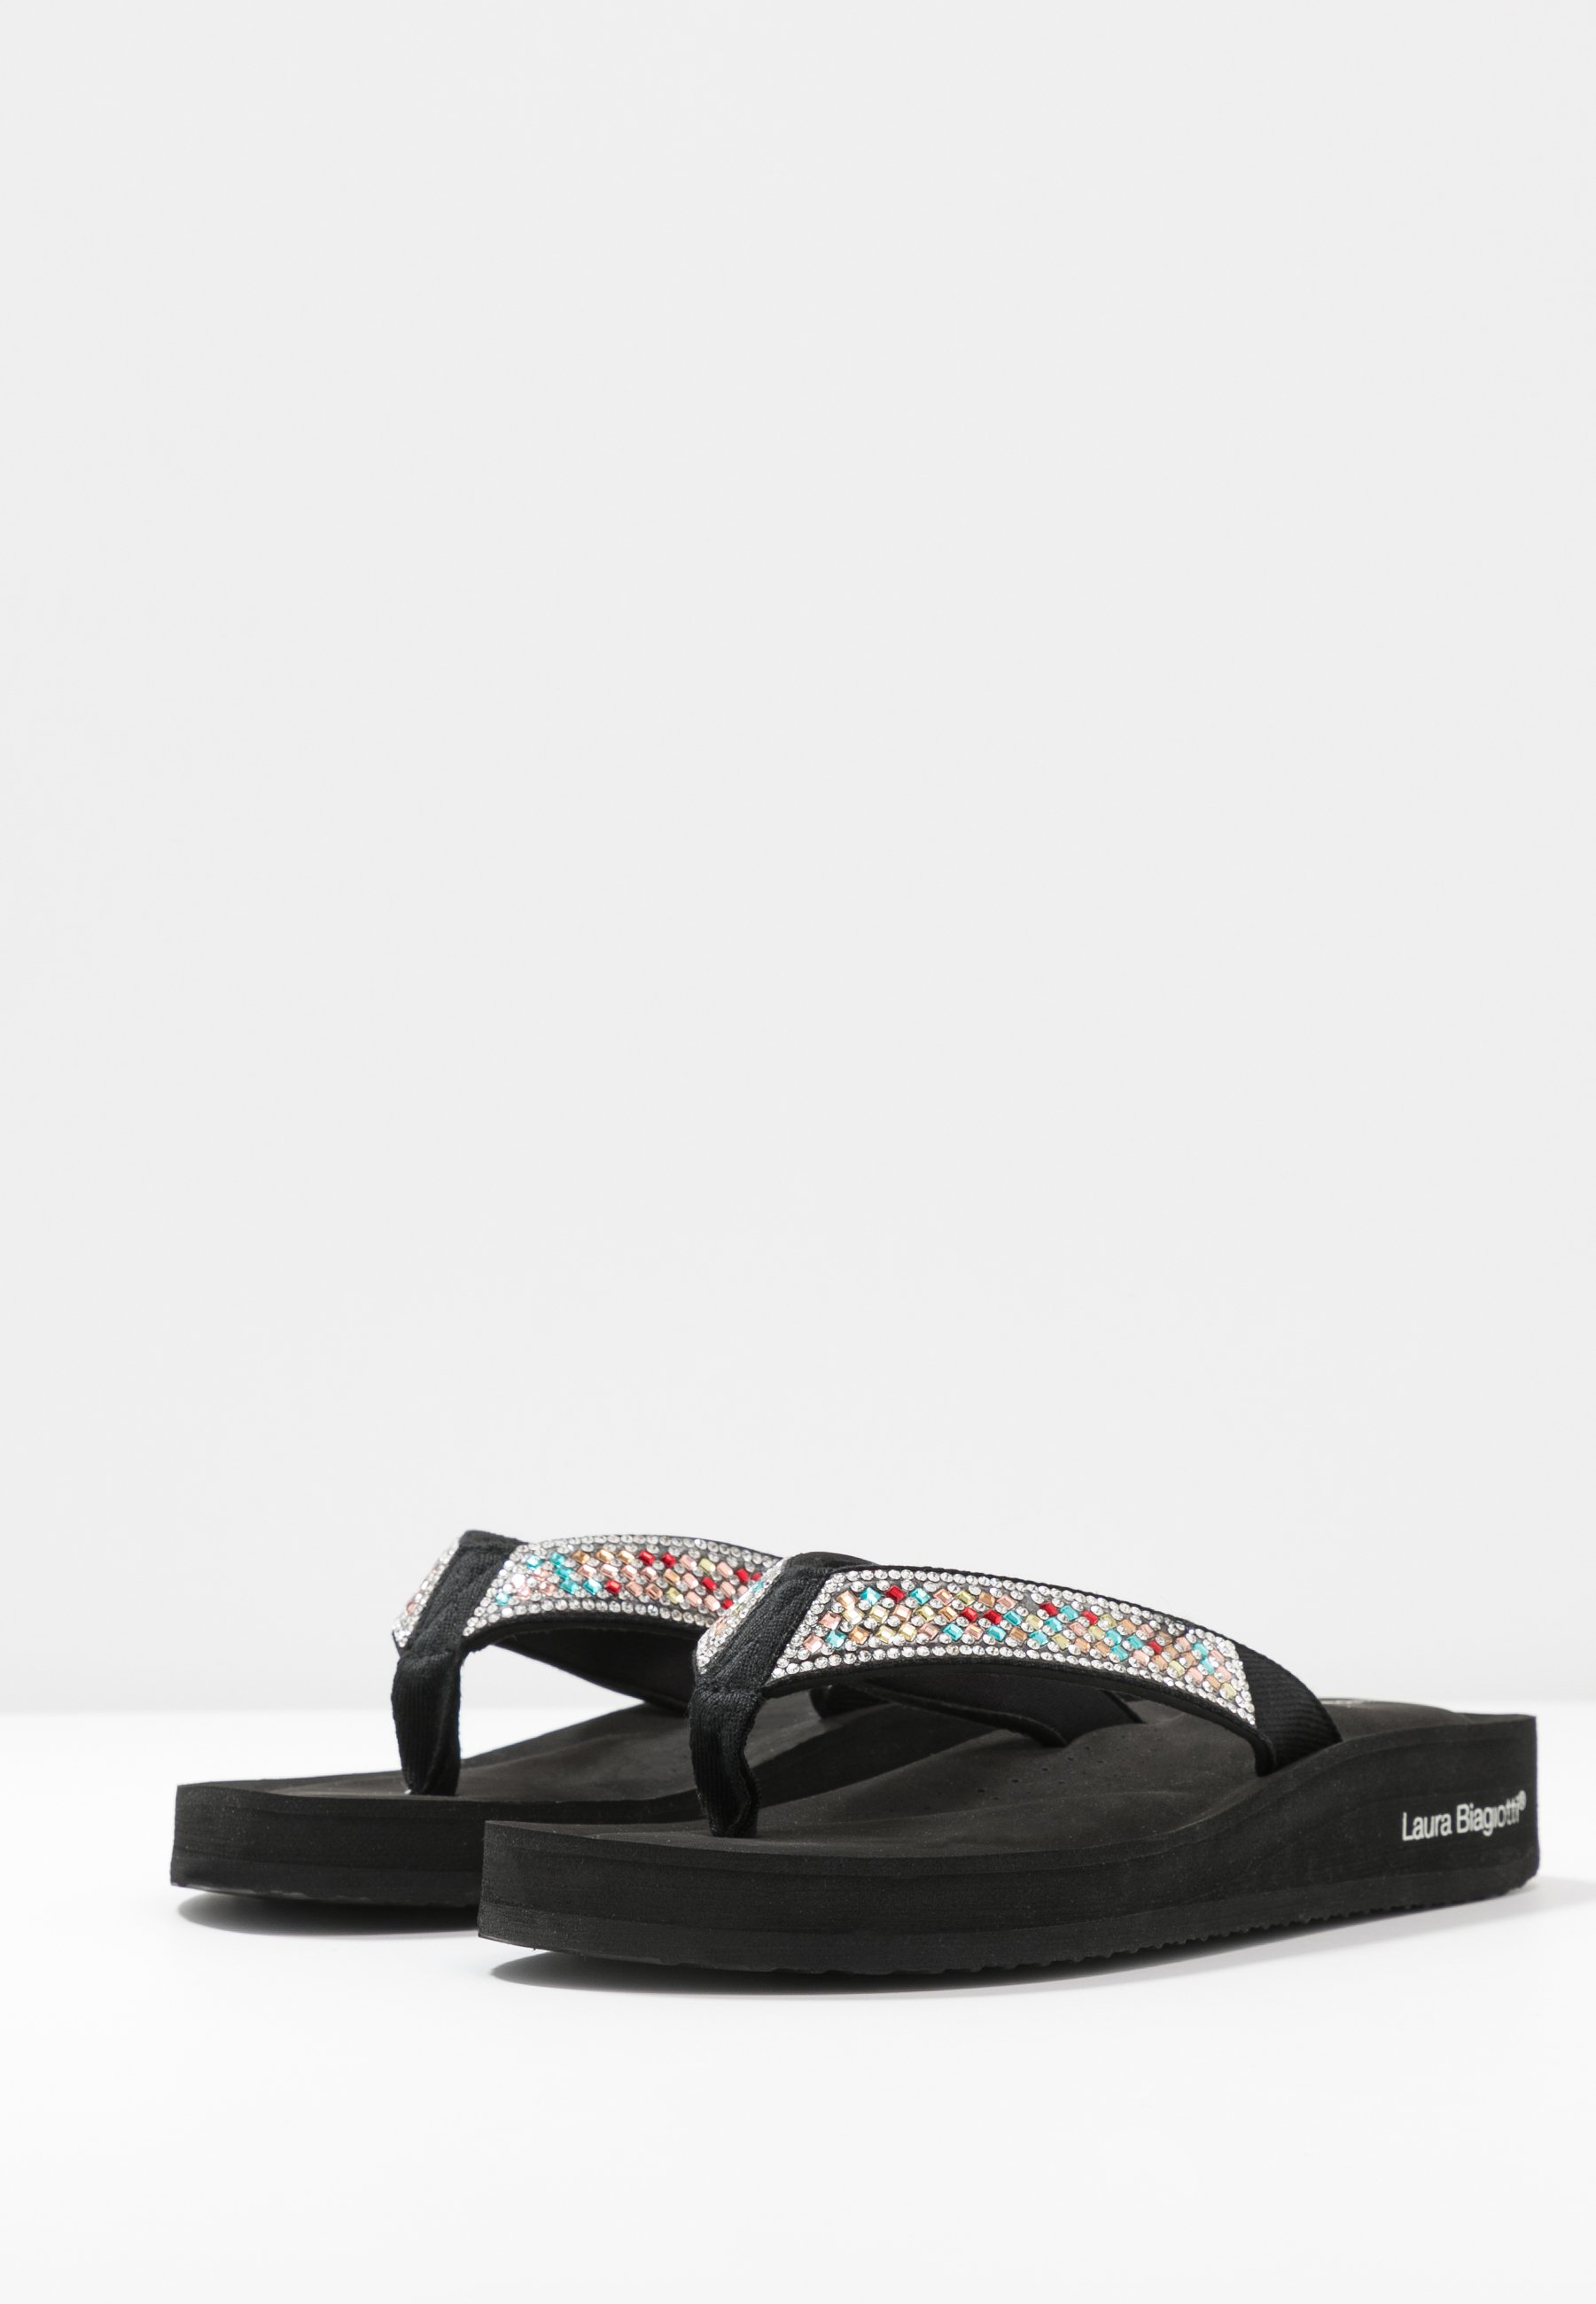 Laura Biagiotti Flip Flops - eva black